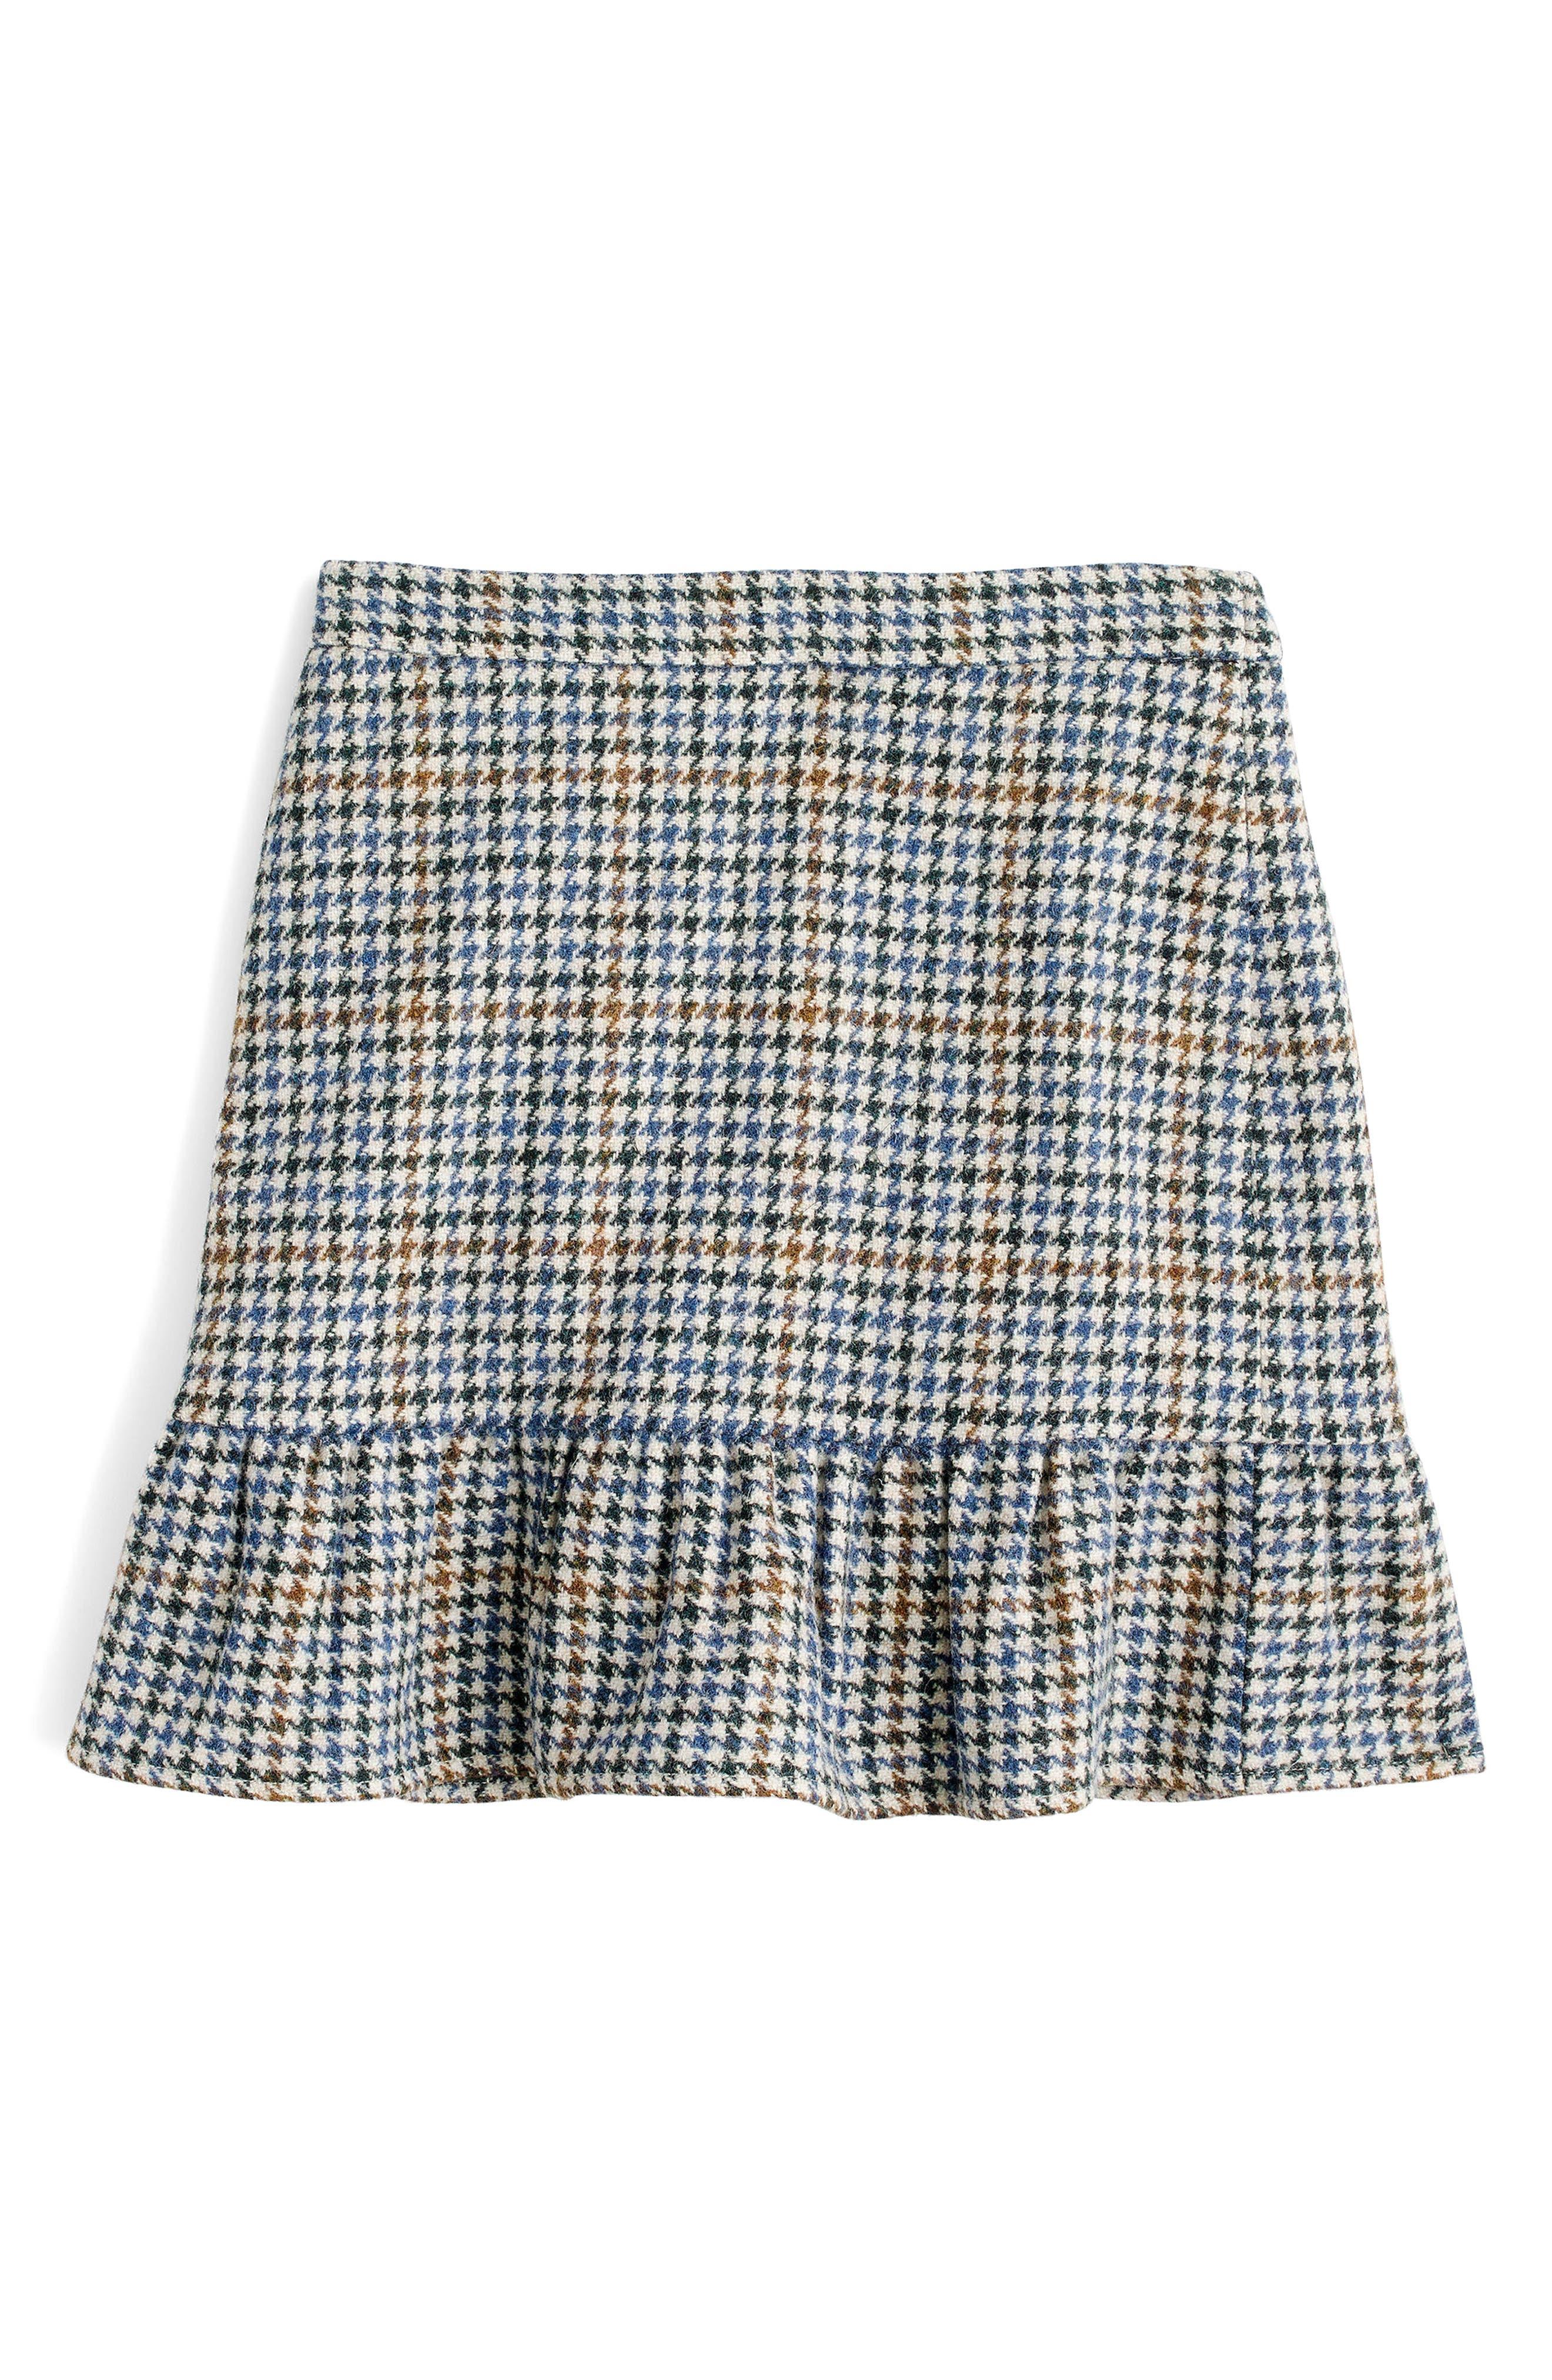 Alternate Image 3  - J.Crew Ruffle Houndstooth Miniskirt